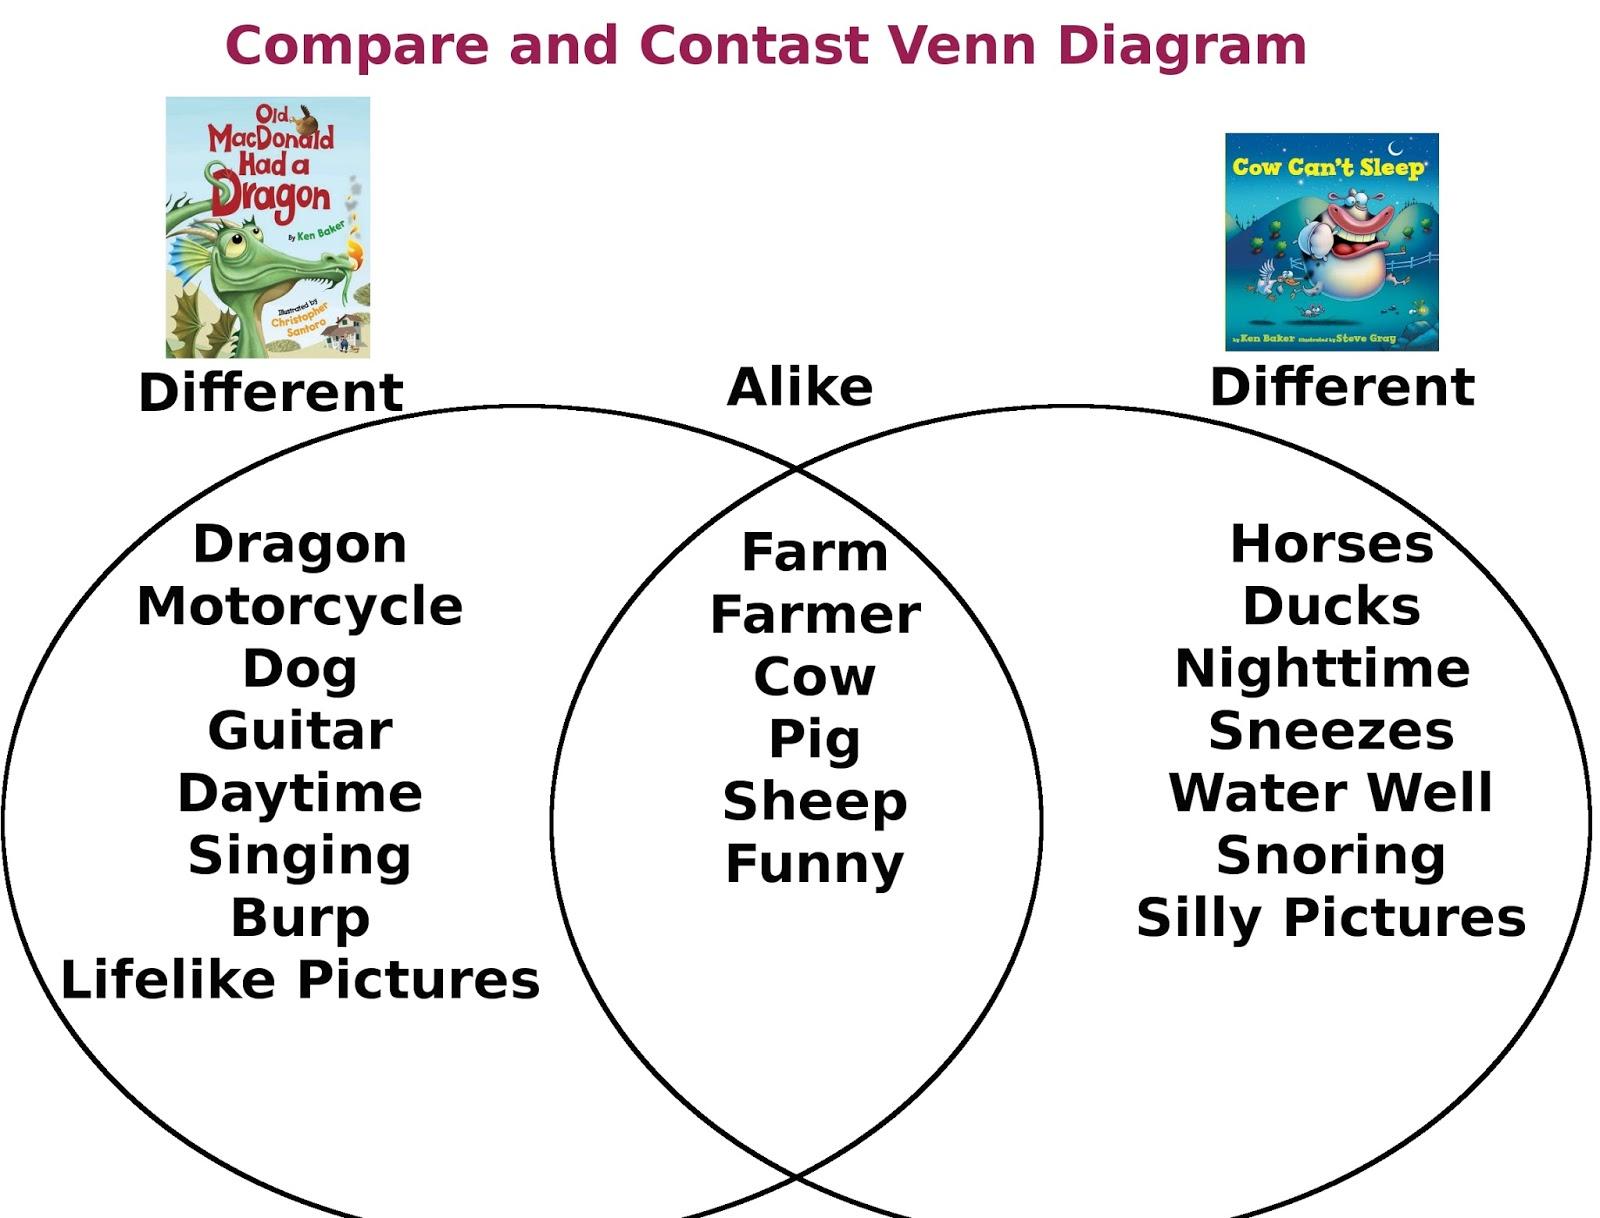 Cinderella Venn Diagram Compare Contrast Bmw E30 Radio Wiring Ken Baker Author Of Old Macdonald Had A Dragon